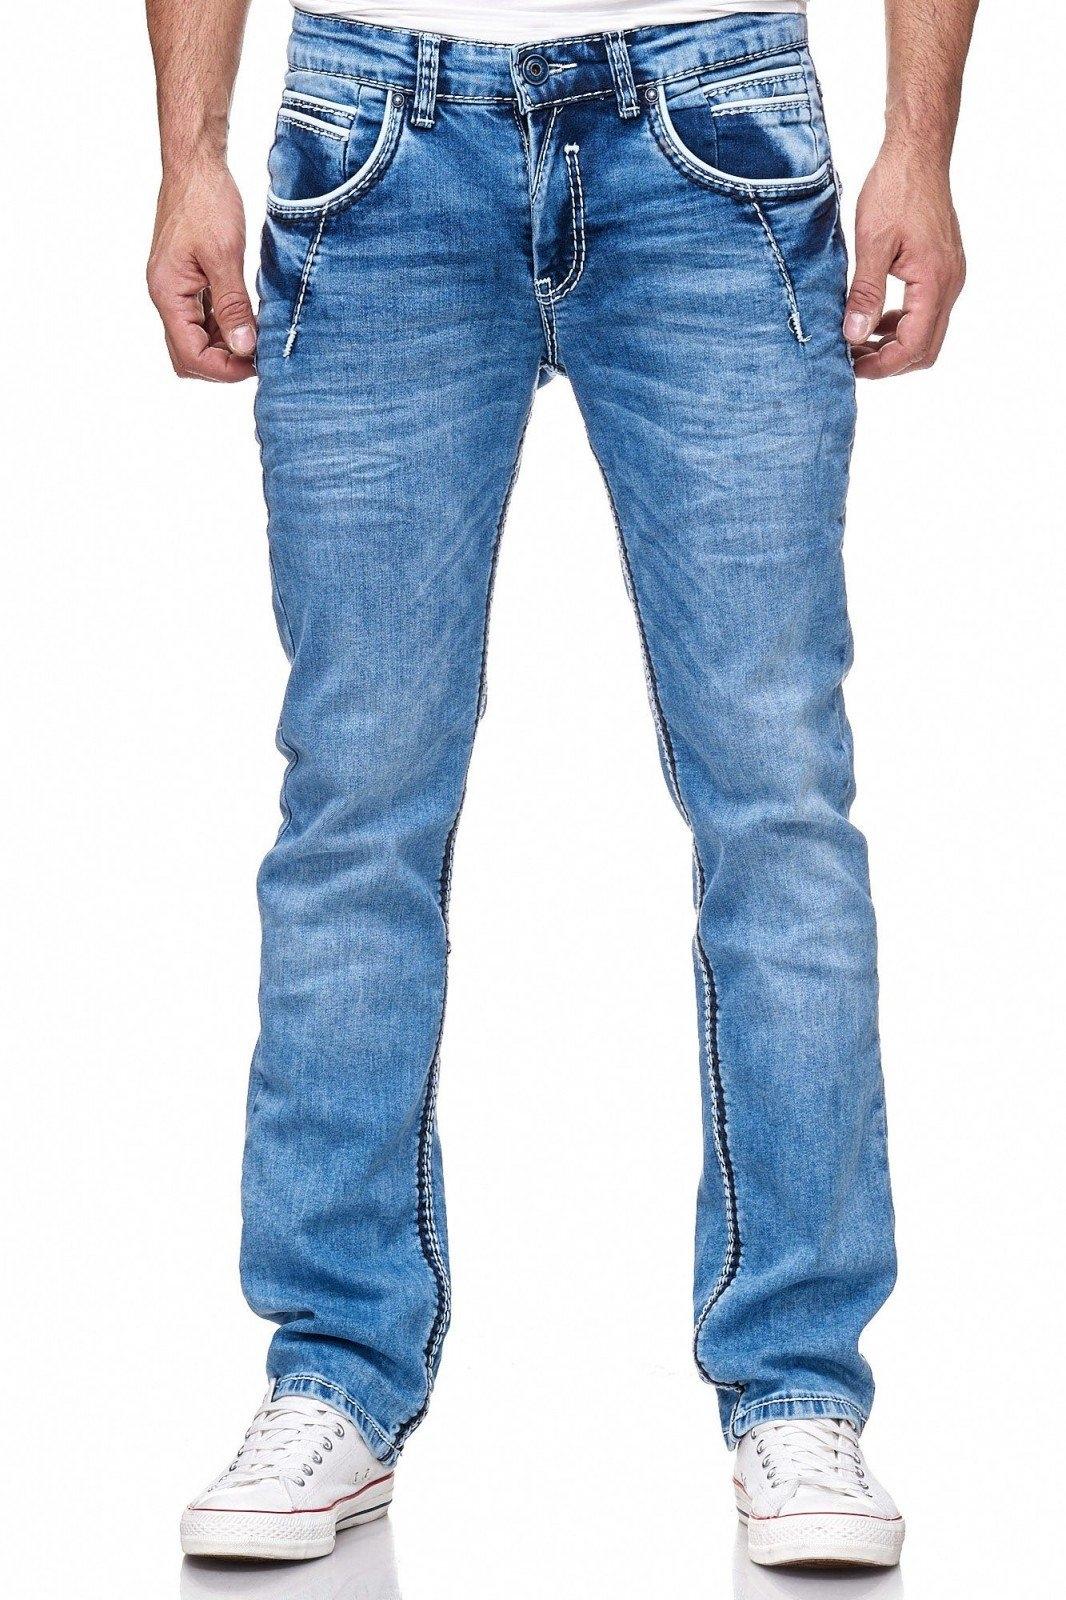 Rusty Neal Jeans - verschillende betaalmethodes